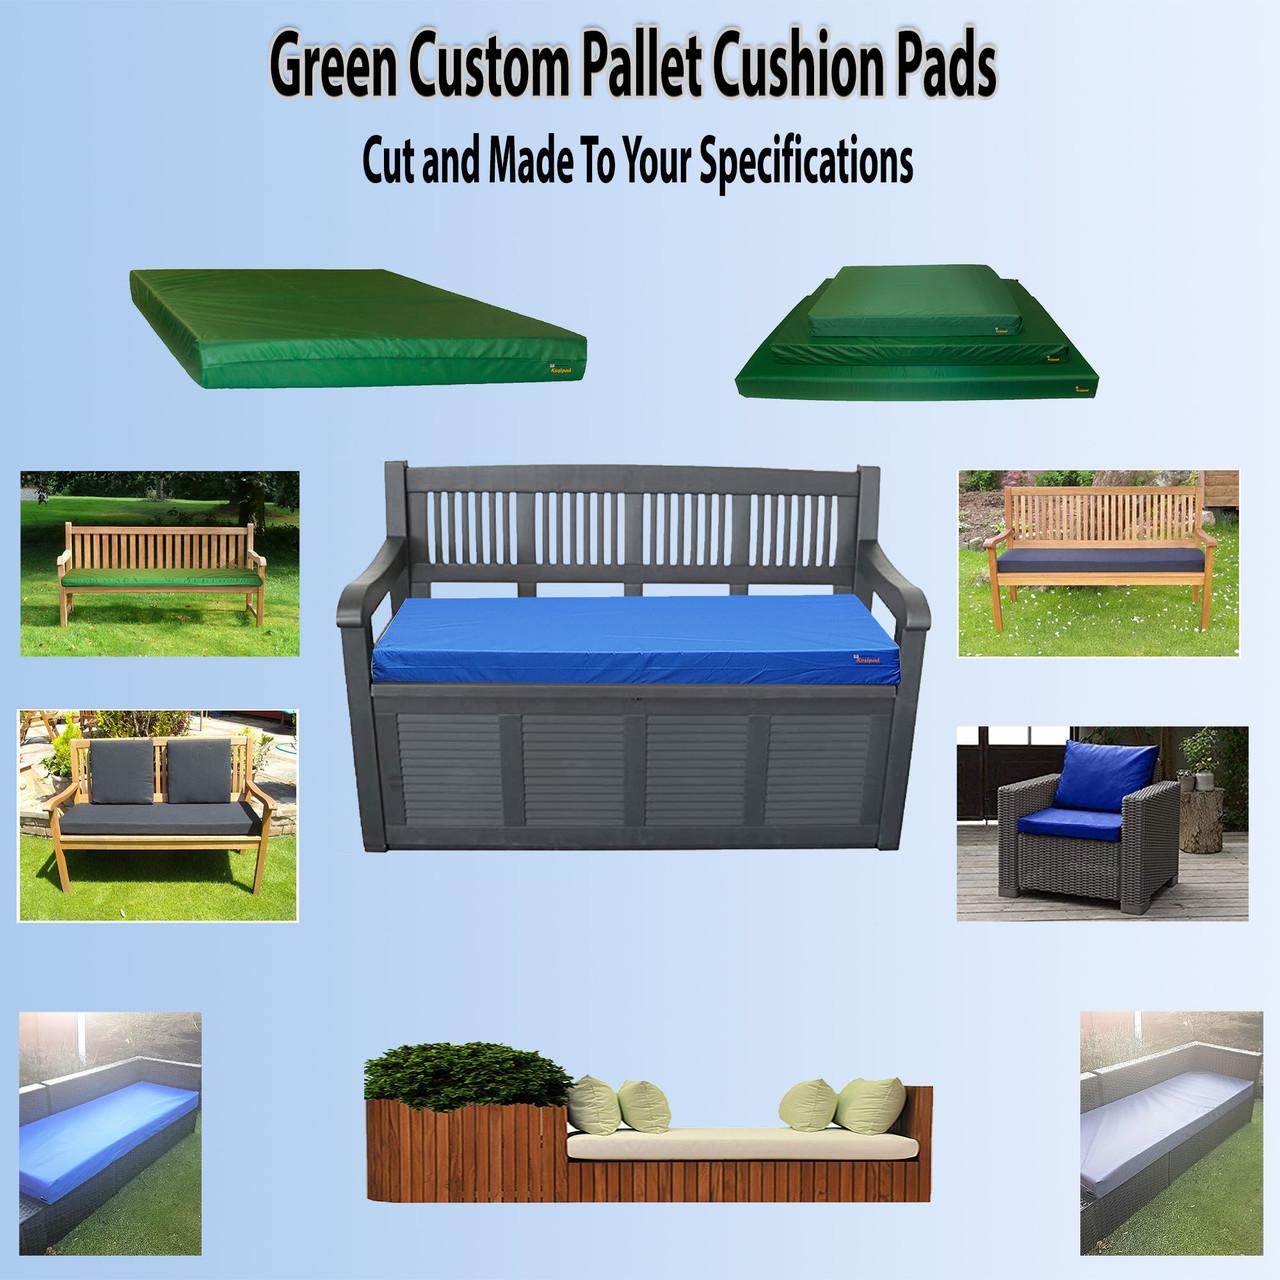 green-Custom-pallet-cushion-pads-cut-to-size-main